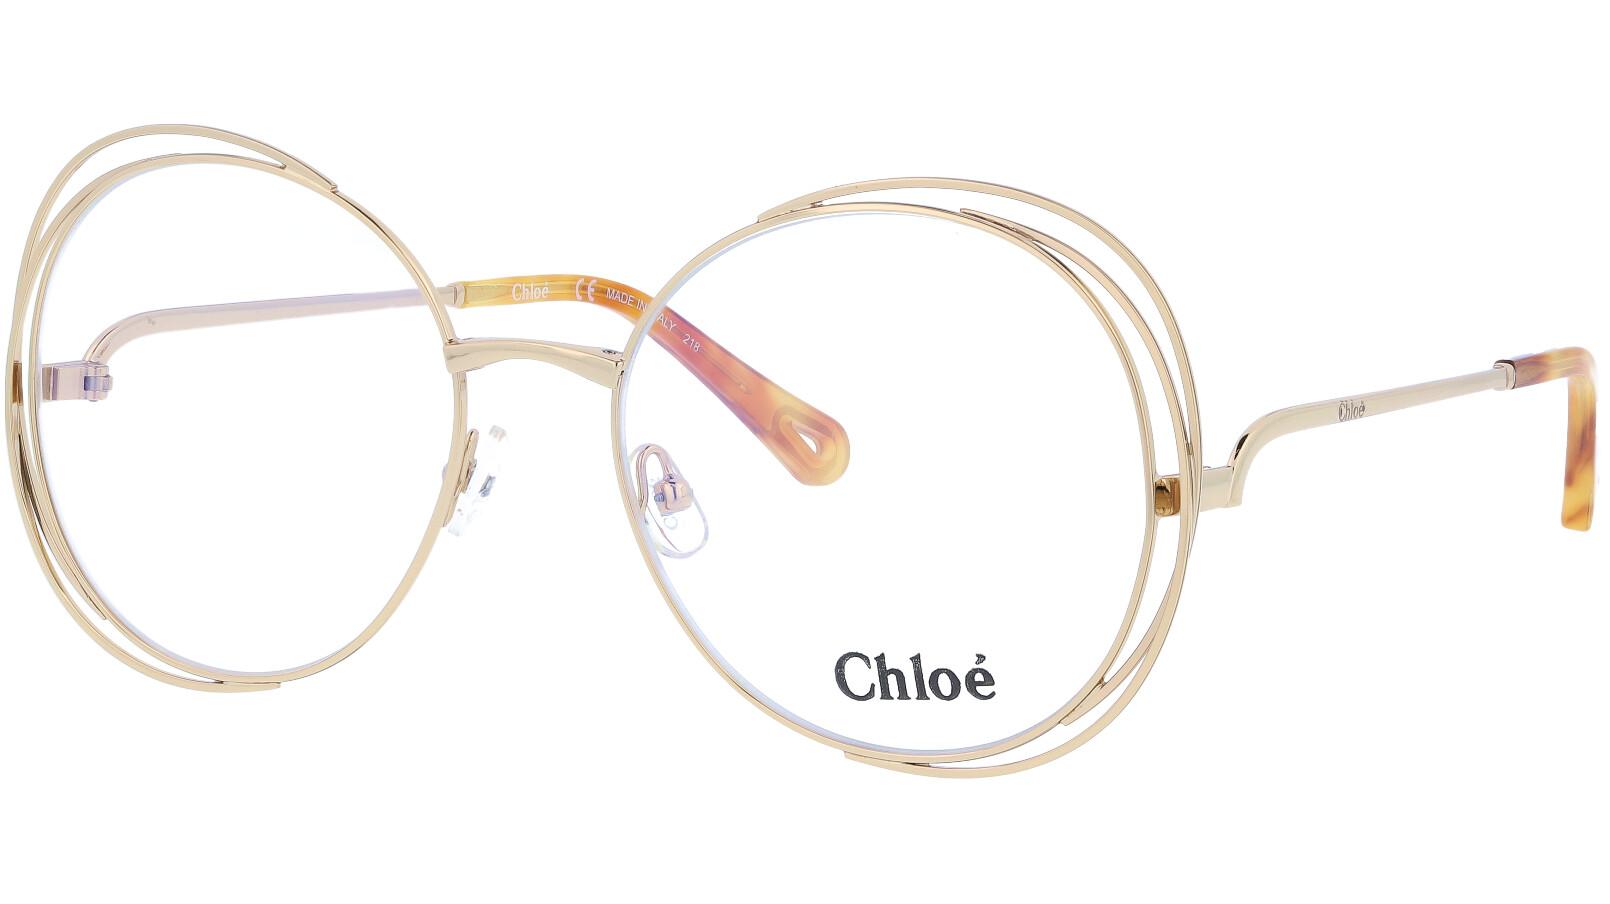 CHLOE CE2138 717 56 GOLD Glasses